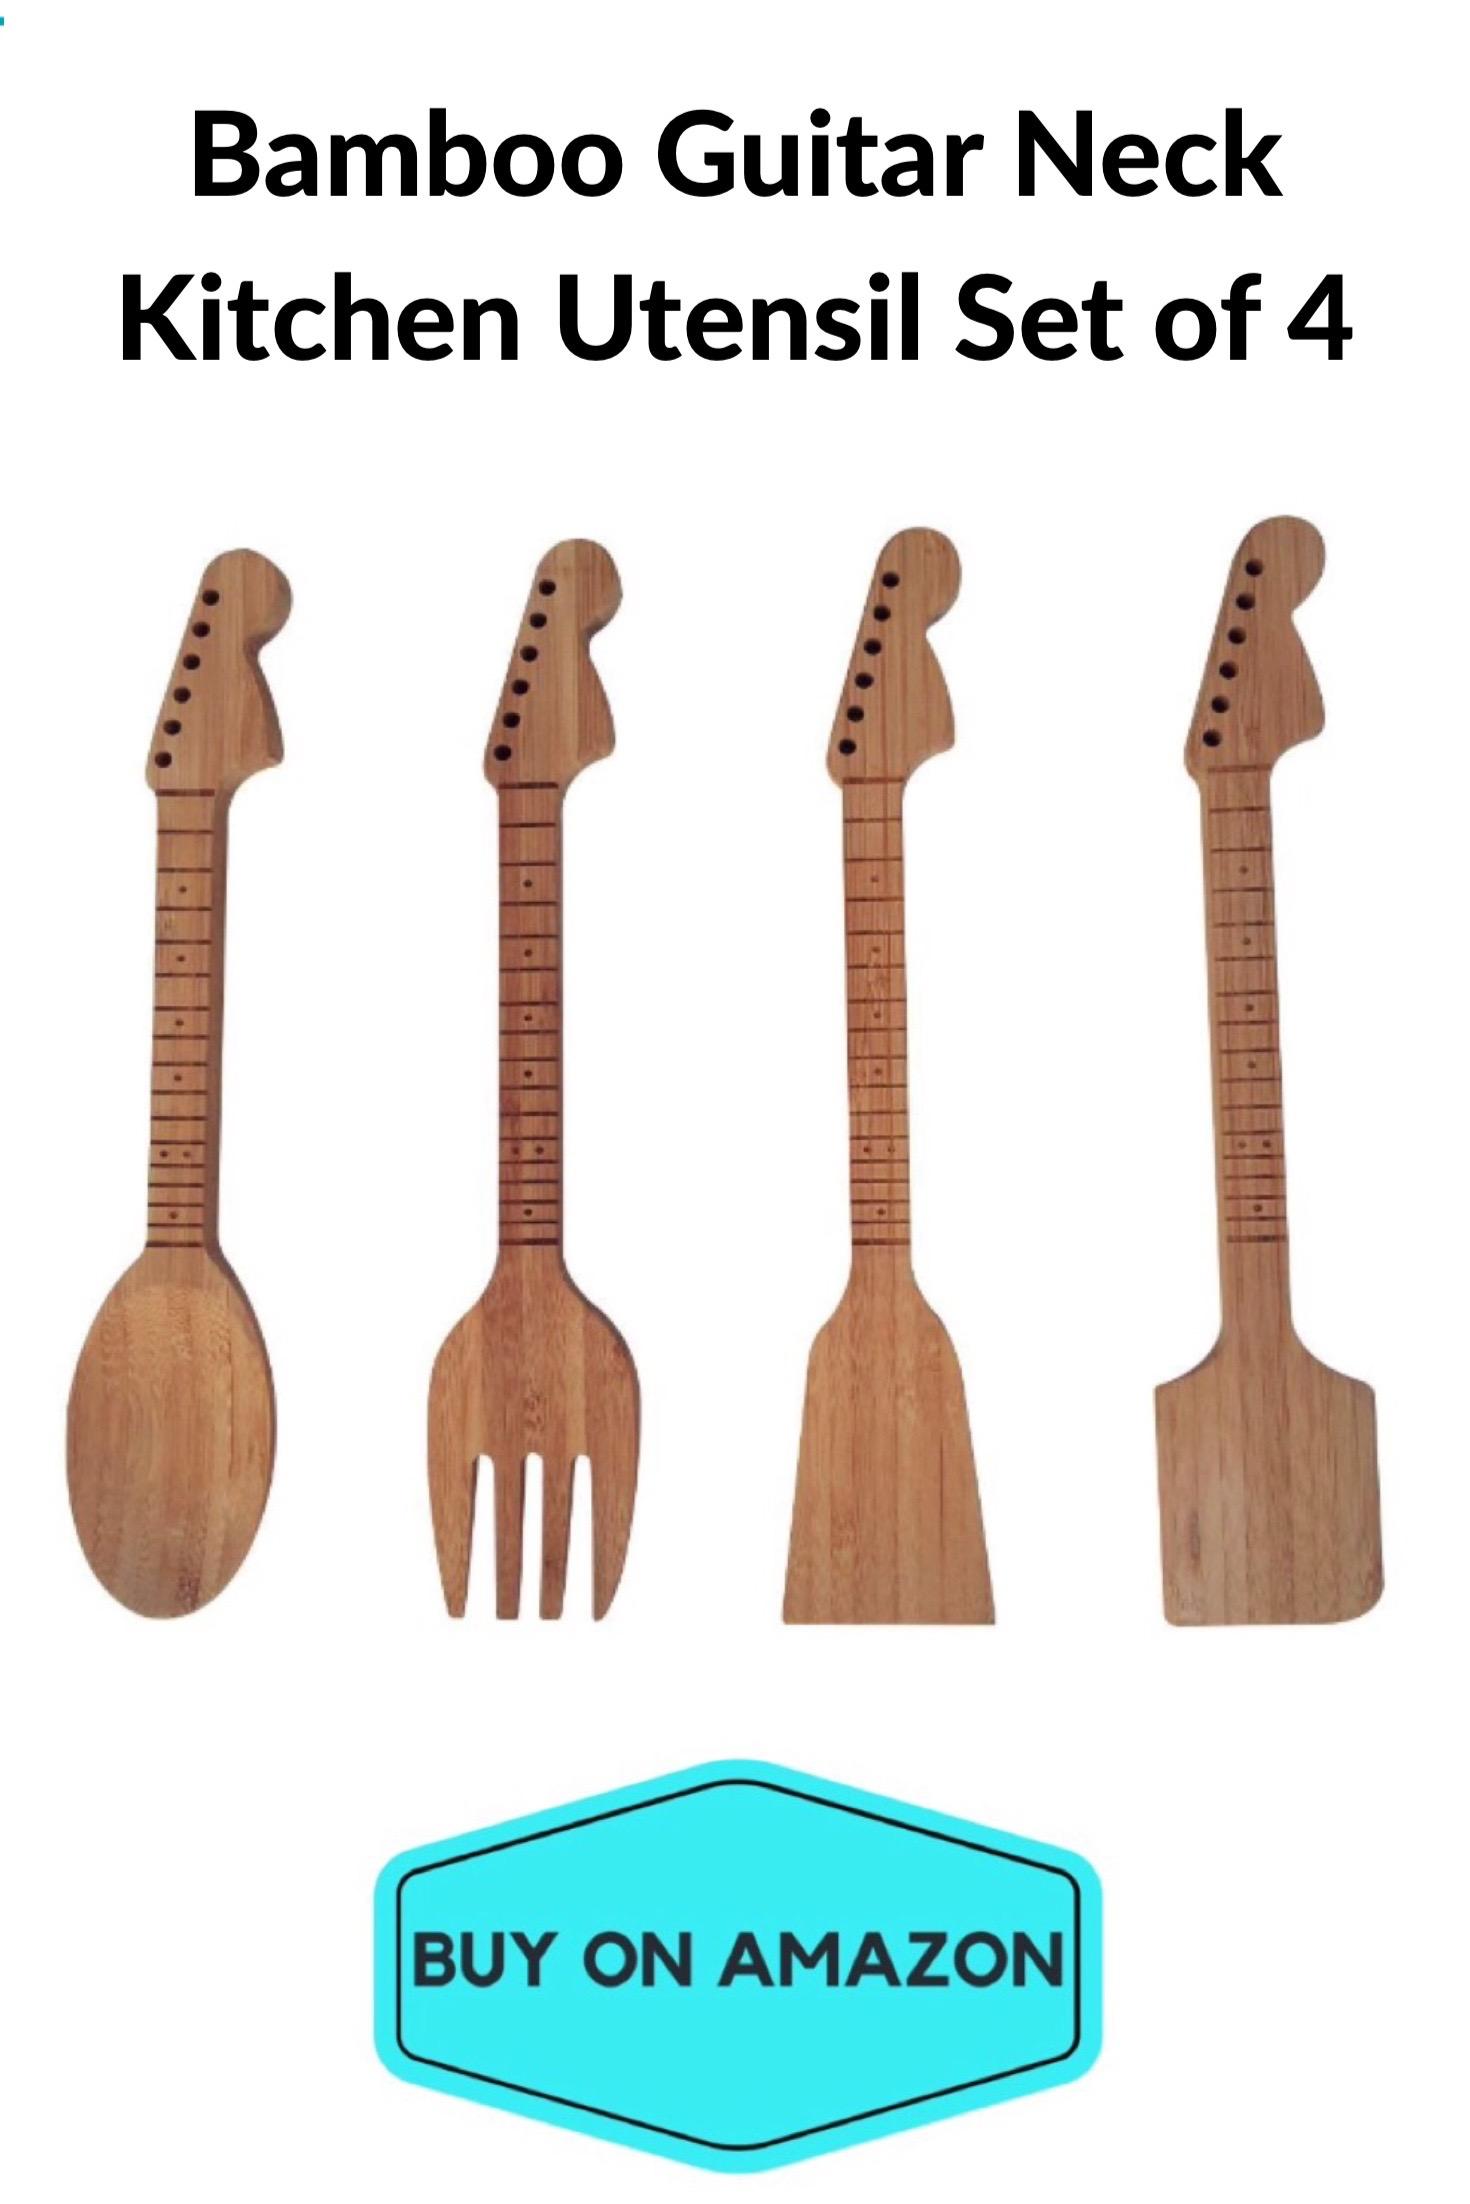 Bamboo Guitar Neck Kitchen Utensil Set of 4